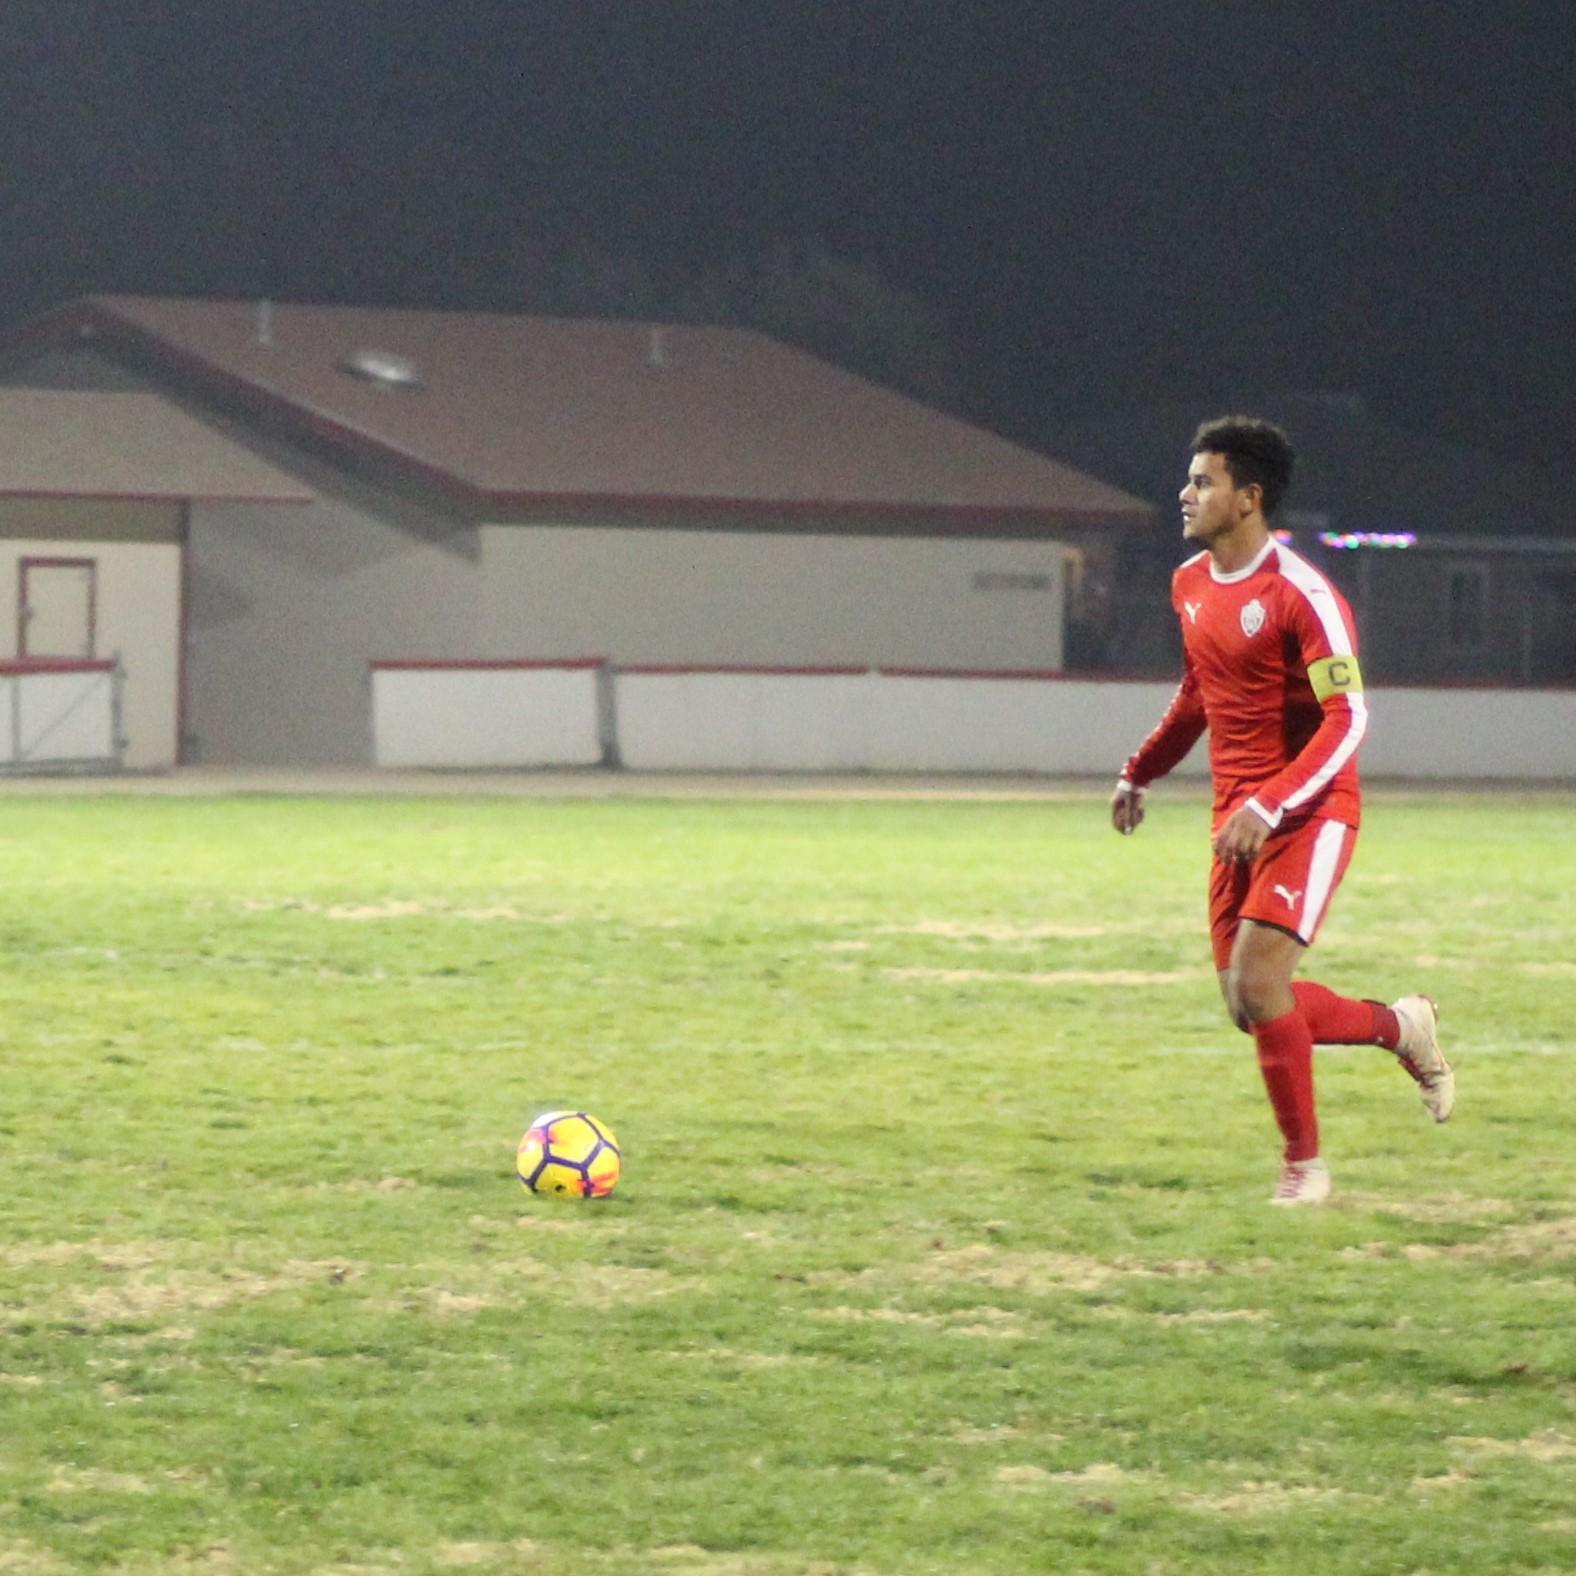 Antonio Ochoa Running with the Ball